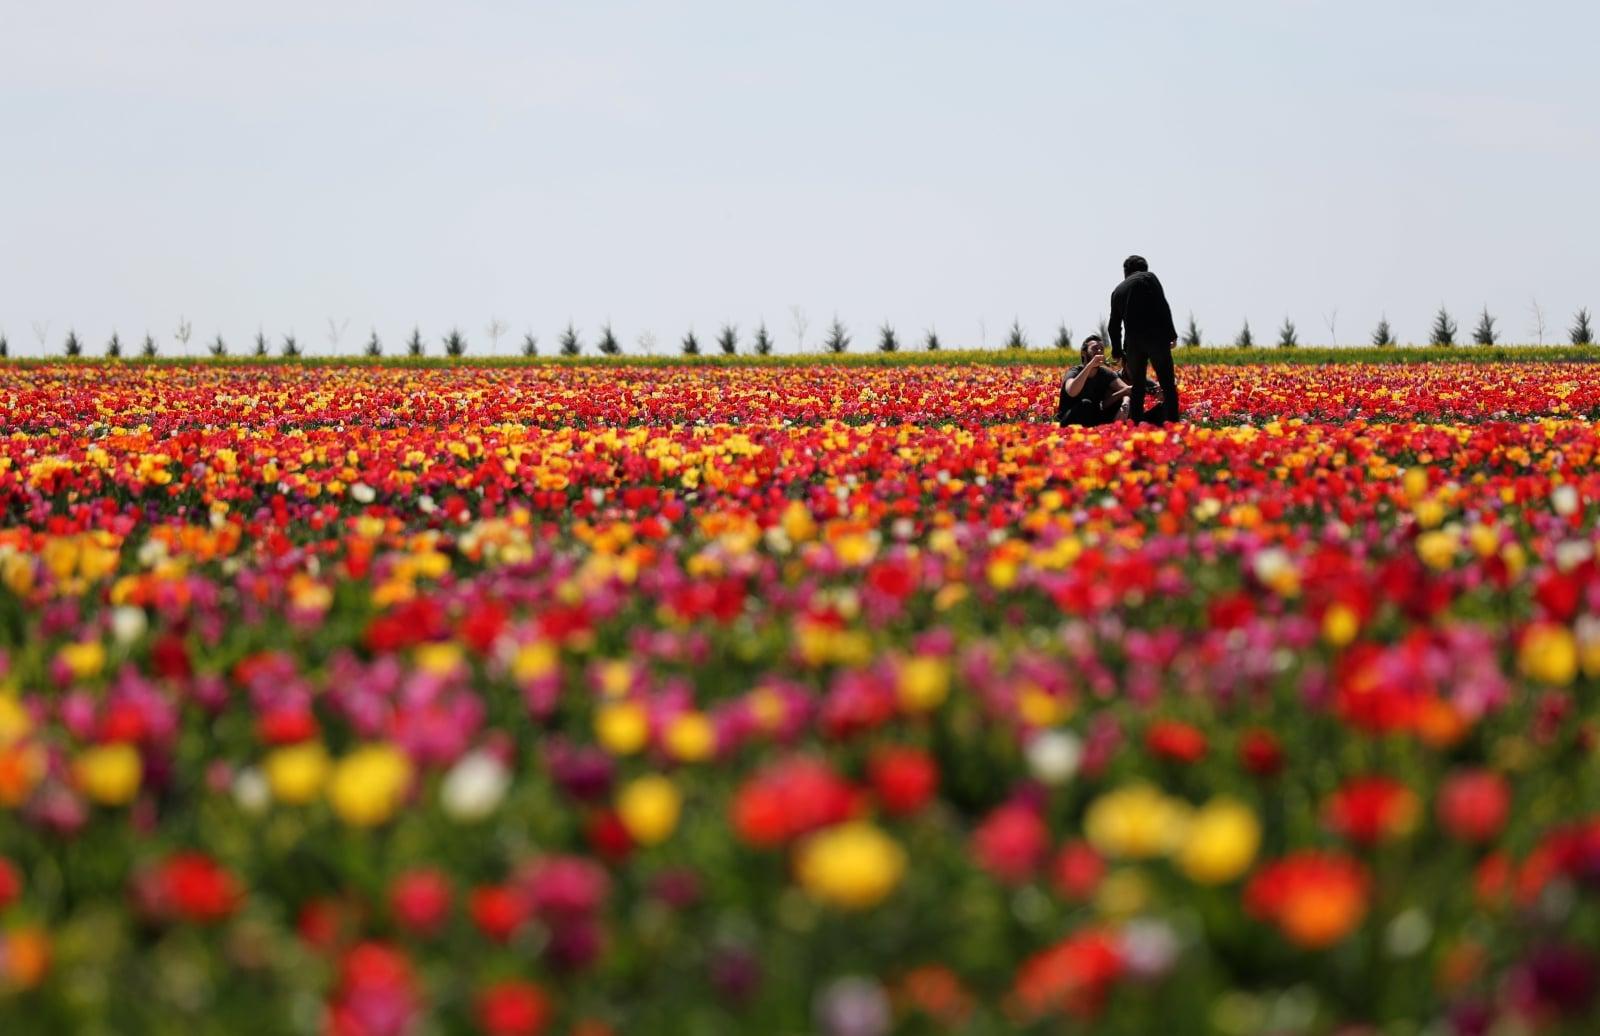 Pola tulipanów w Turcji  EPA/TOLGA BOZOGLU